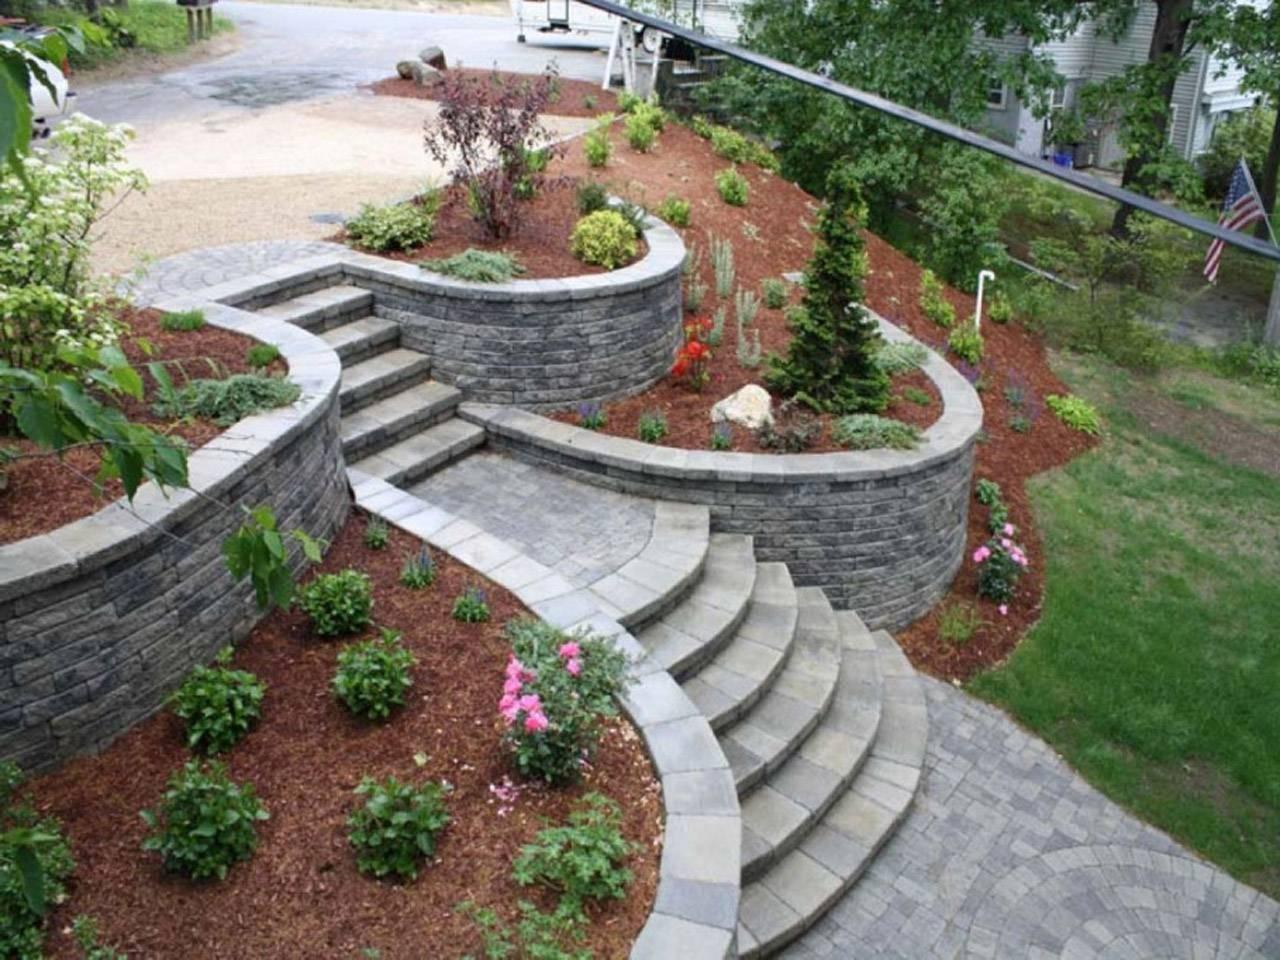 10 Stylish Landscaping Ideas For A Sloped Backyard 2019